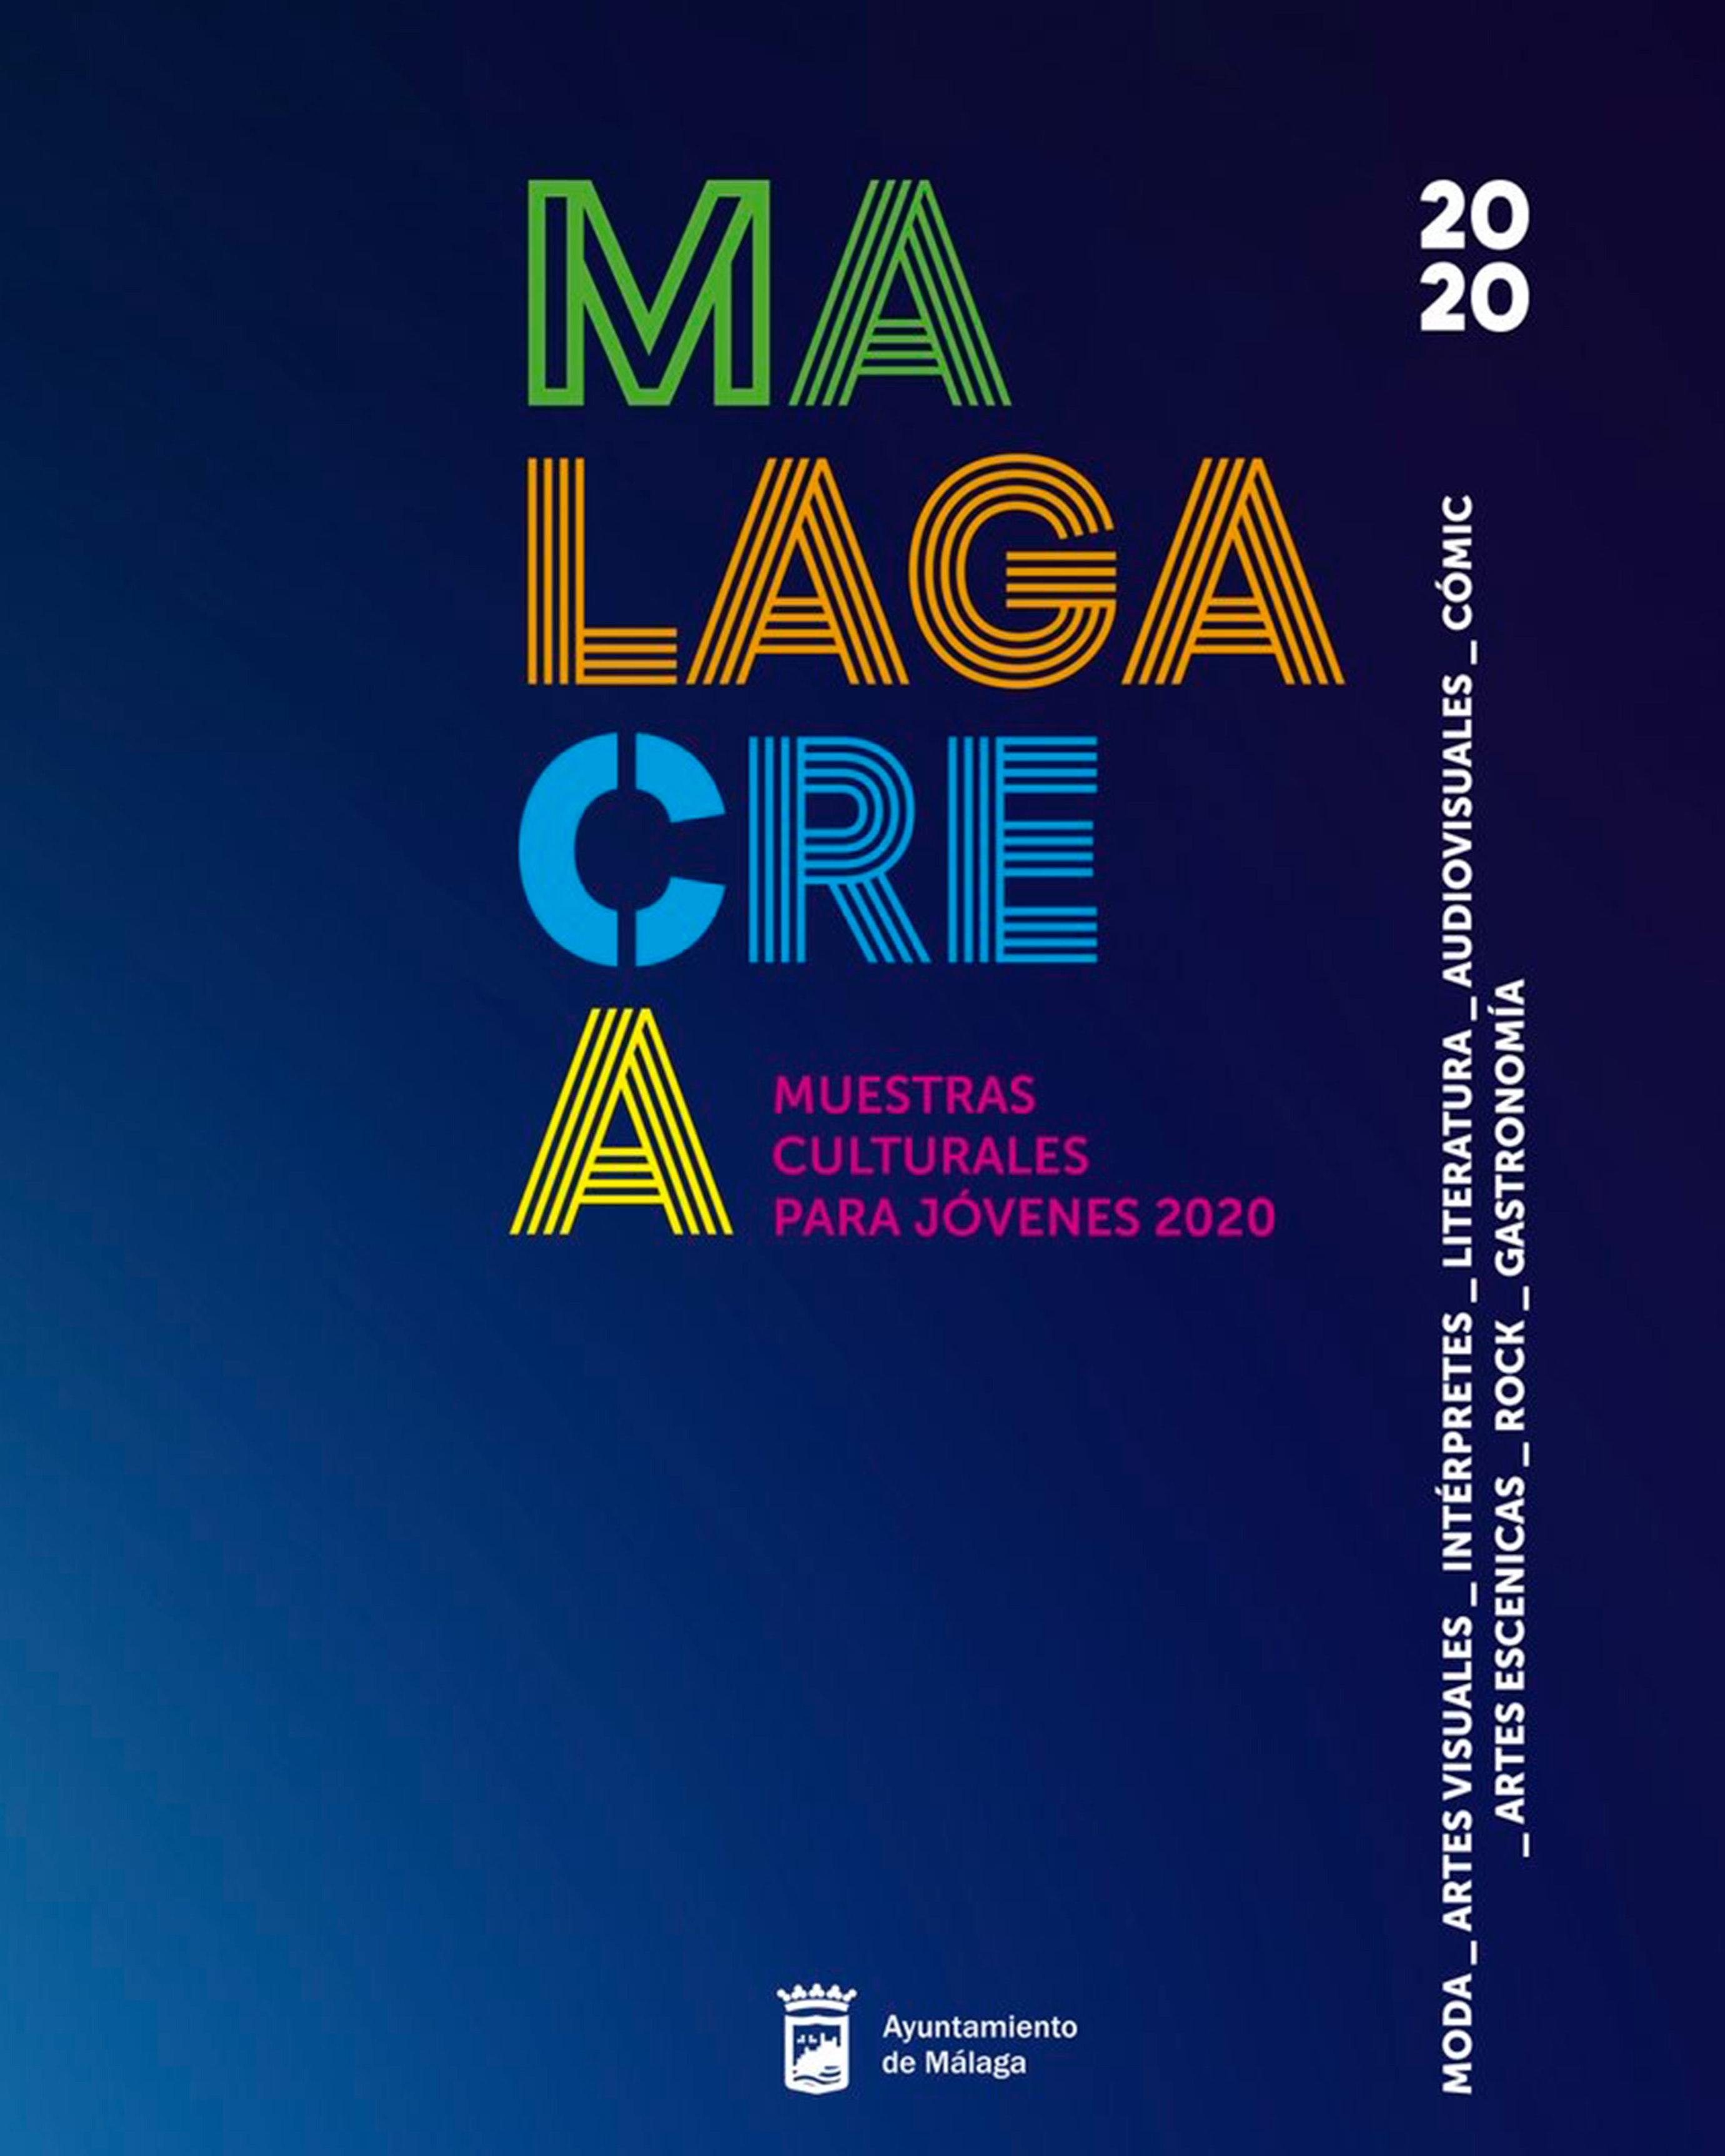 MálagaCrea 2020, Muestra Joven Moda en Plaza Mayor Málaga